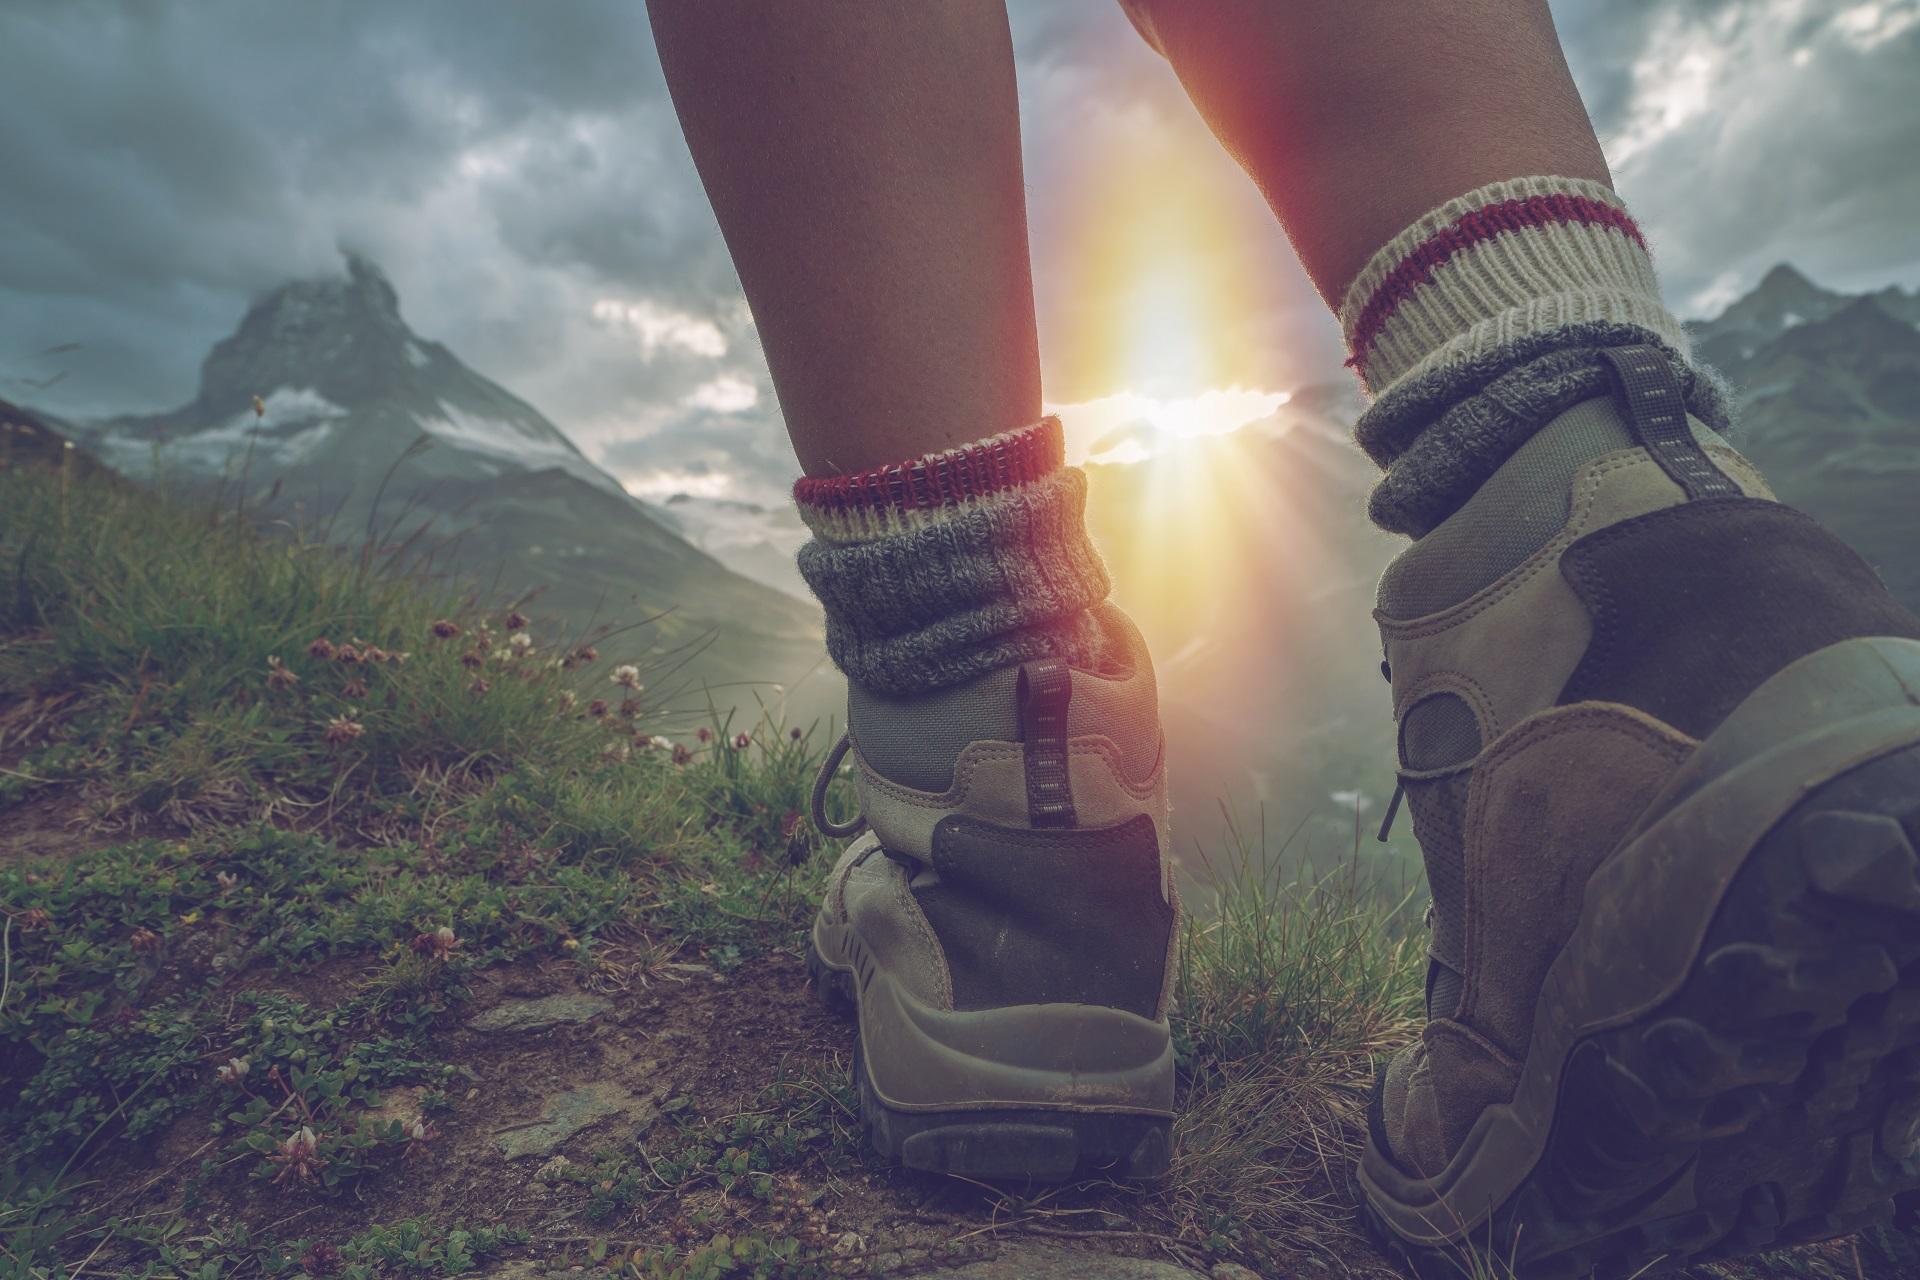 Wanderschuhe in der Natur